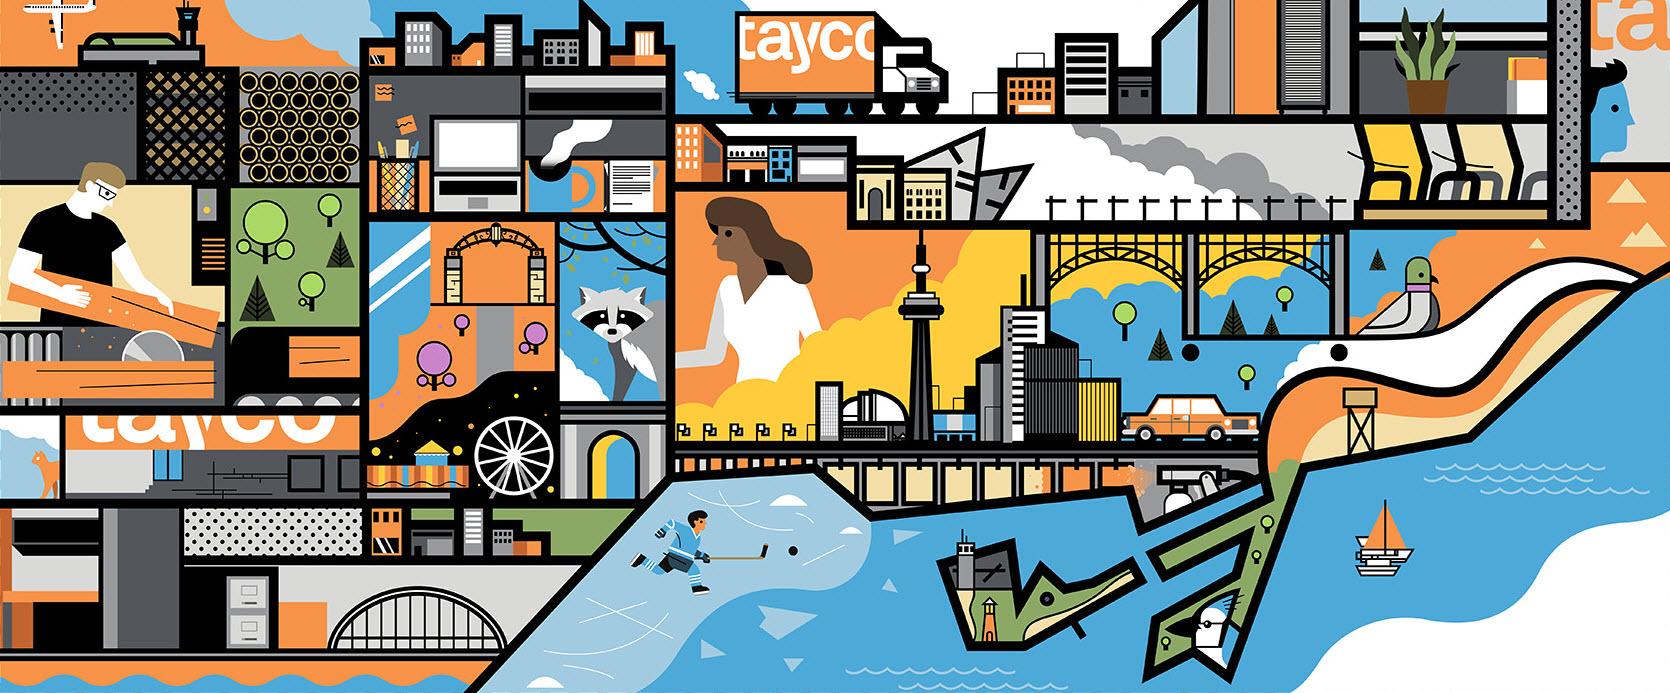 Tayco in Toronto - DM304